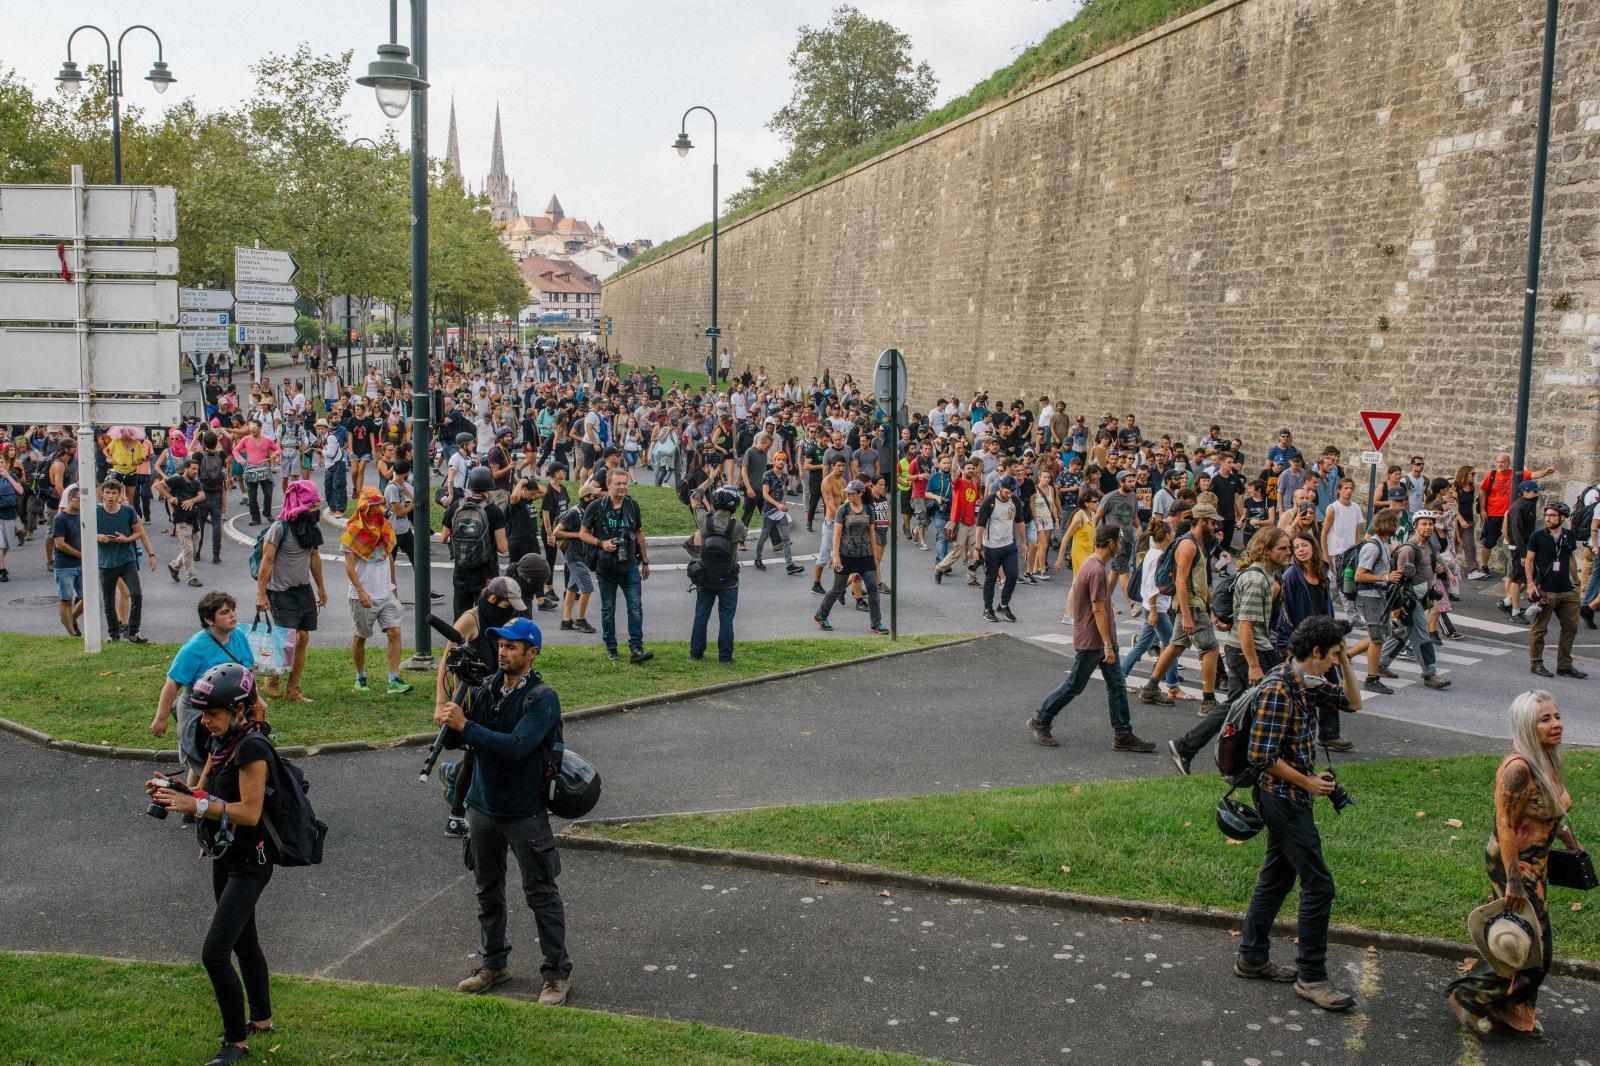 2019-08-24 - Spontaneous demonstration in Bayonne.